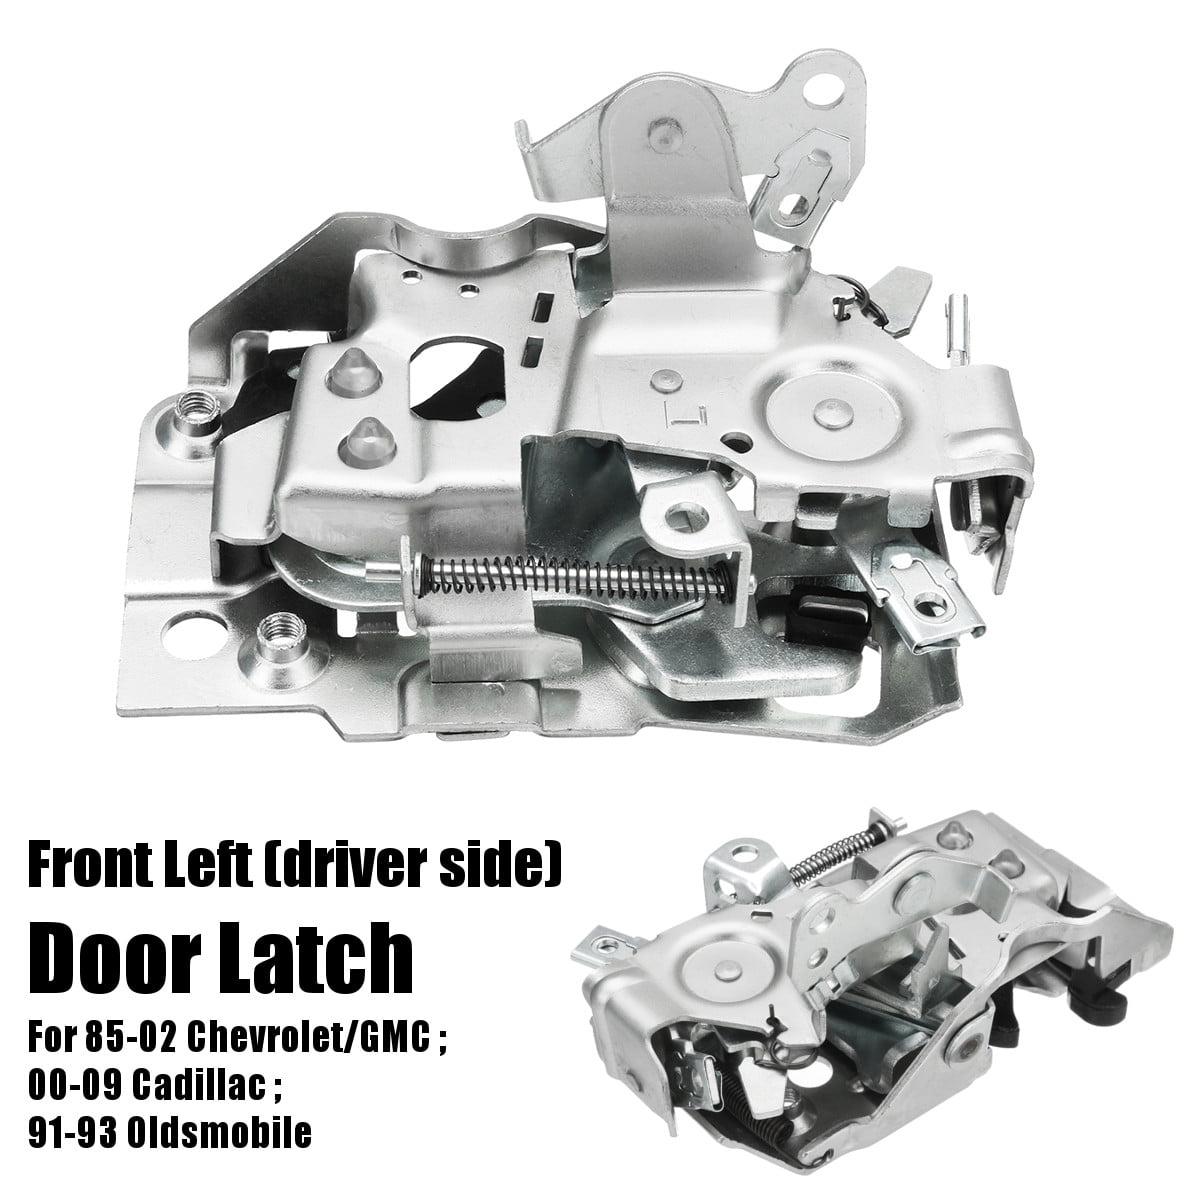 Door Latch Assembly fits GM Front Driver Side Left Dorman 940-102